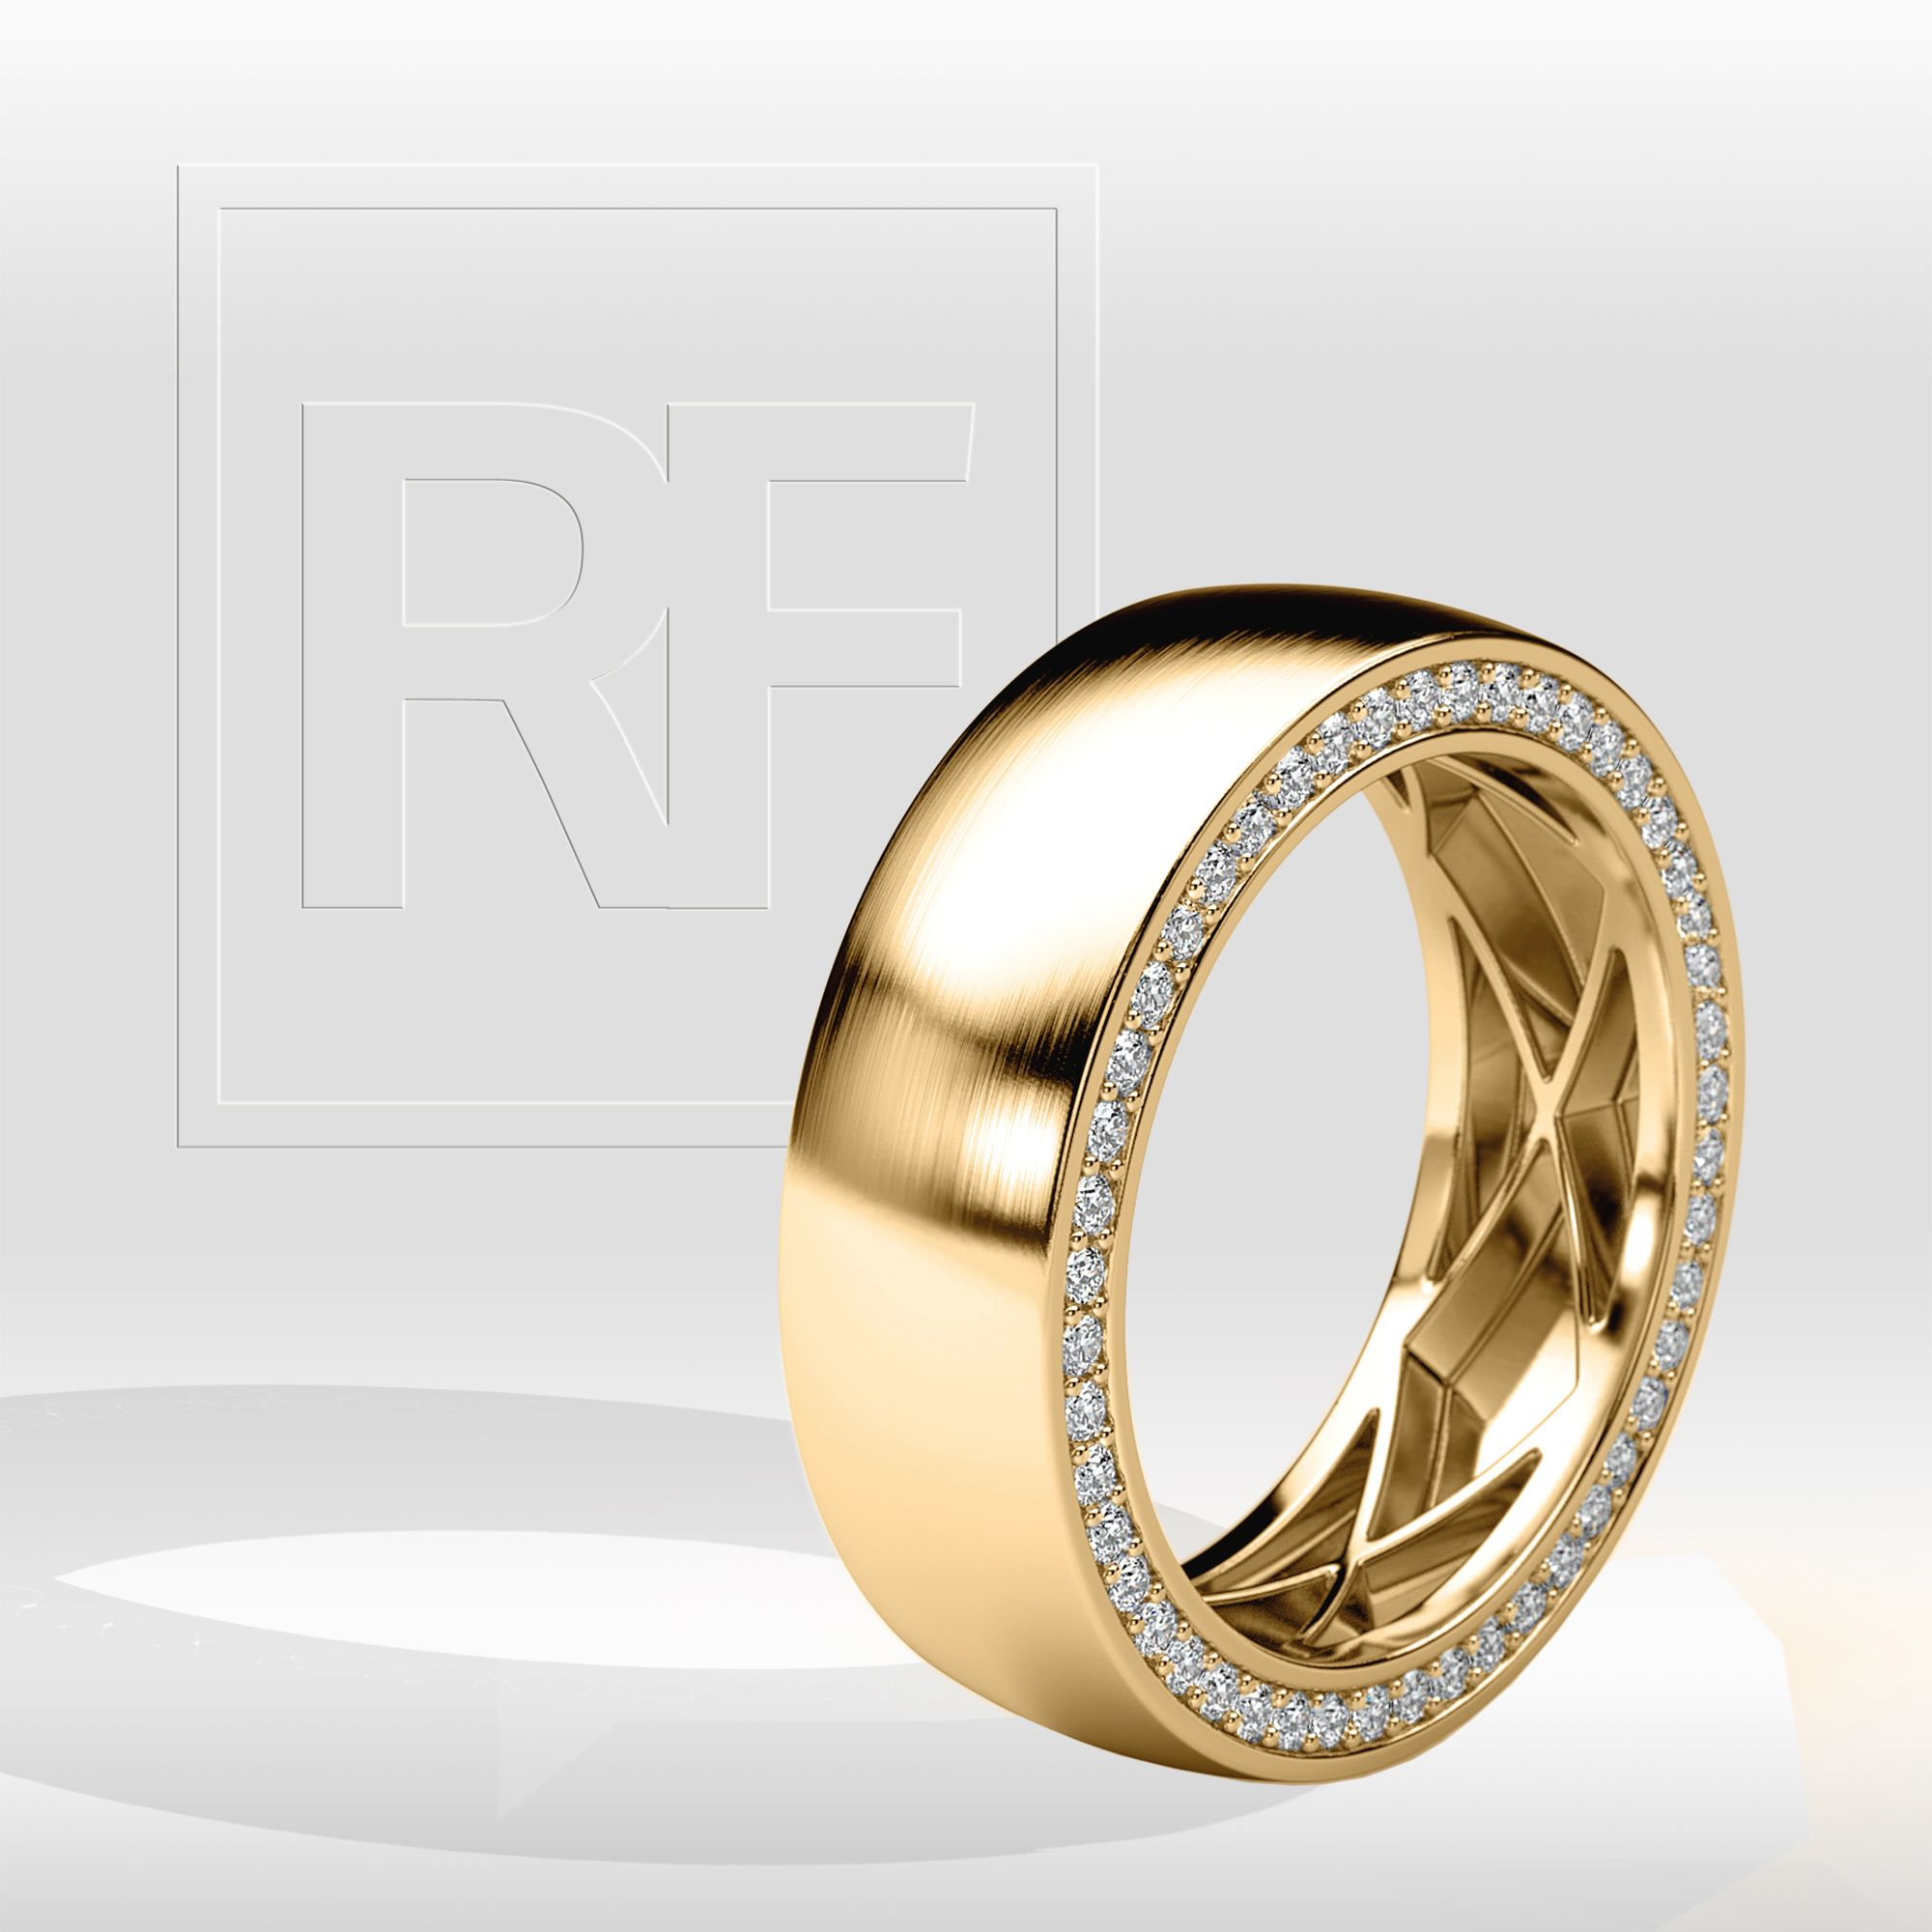 JERRITT Comfort Fit Mens Gold Wedding Band with Diamonds